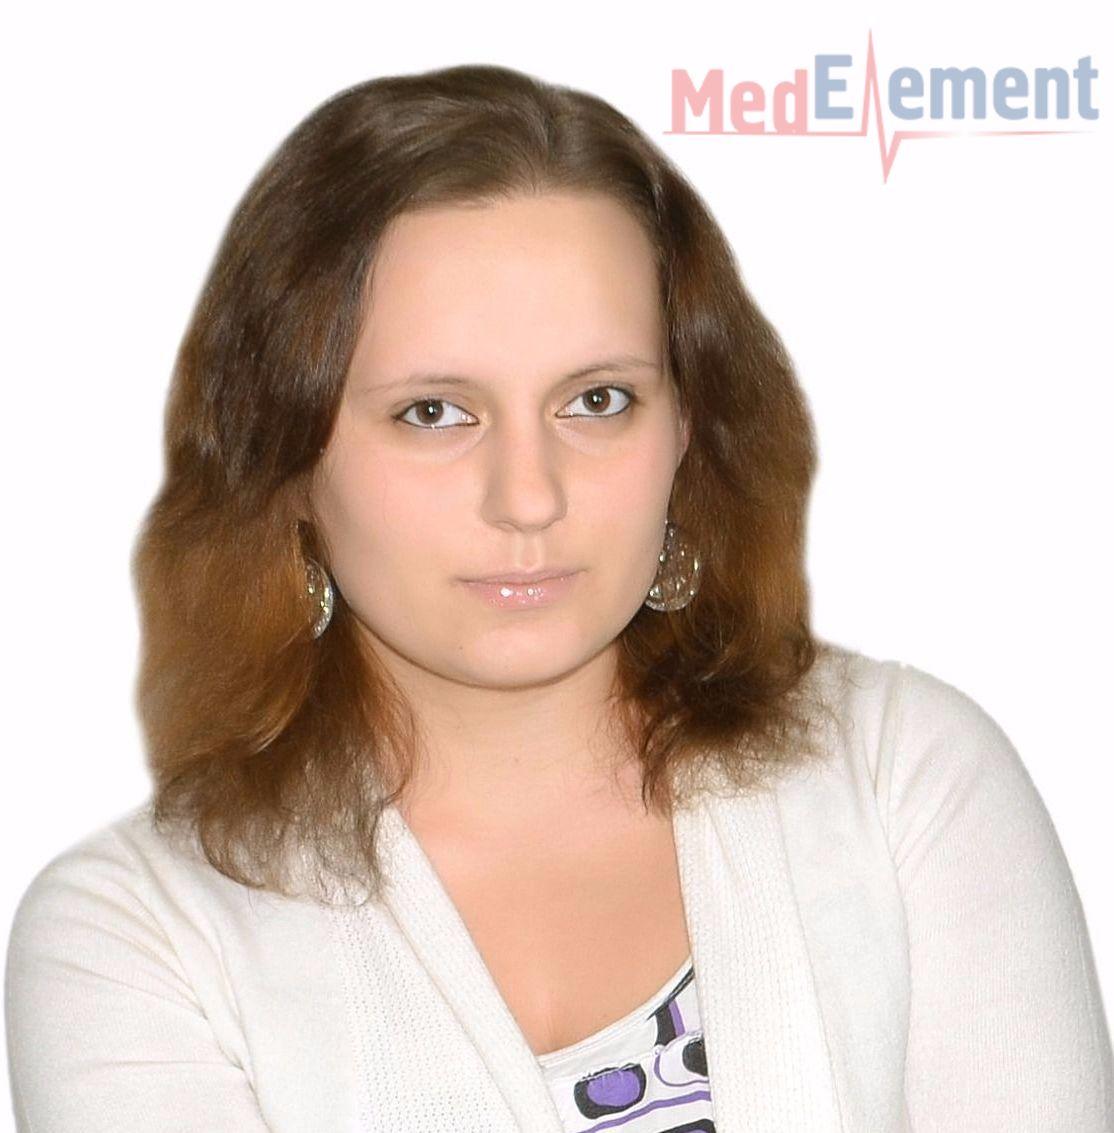 Березняк Ксения Сергеевна